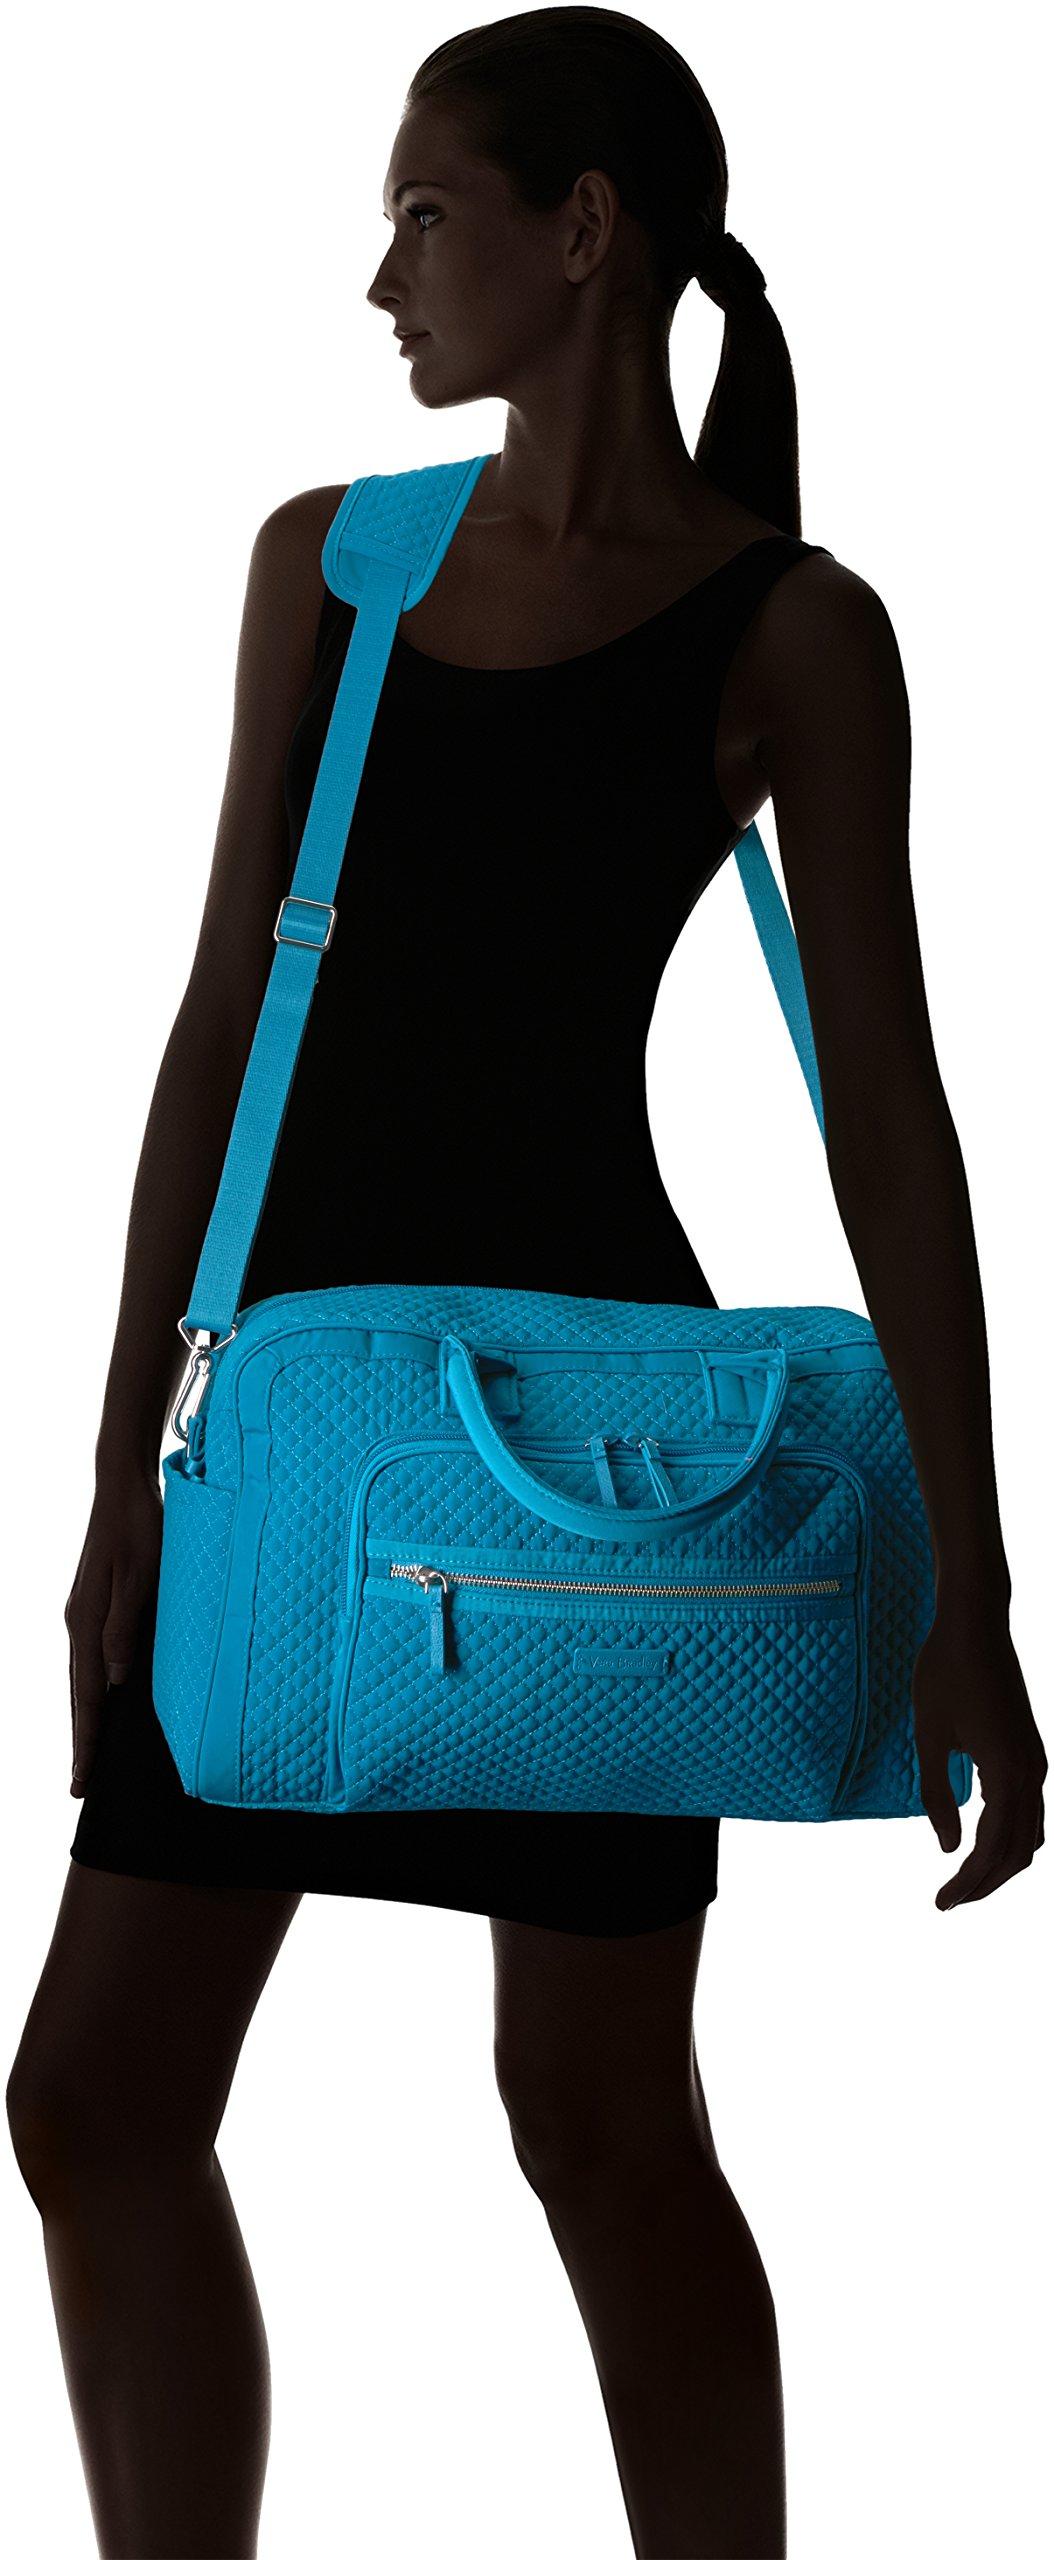 Vera Bradley Women's Iconic Compact Weekender Travel Bag Vera, Bahama Bay by Vera Bradley (Image #6)